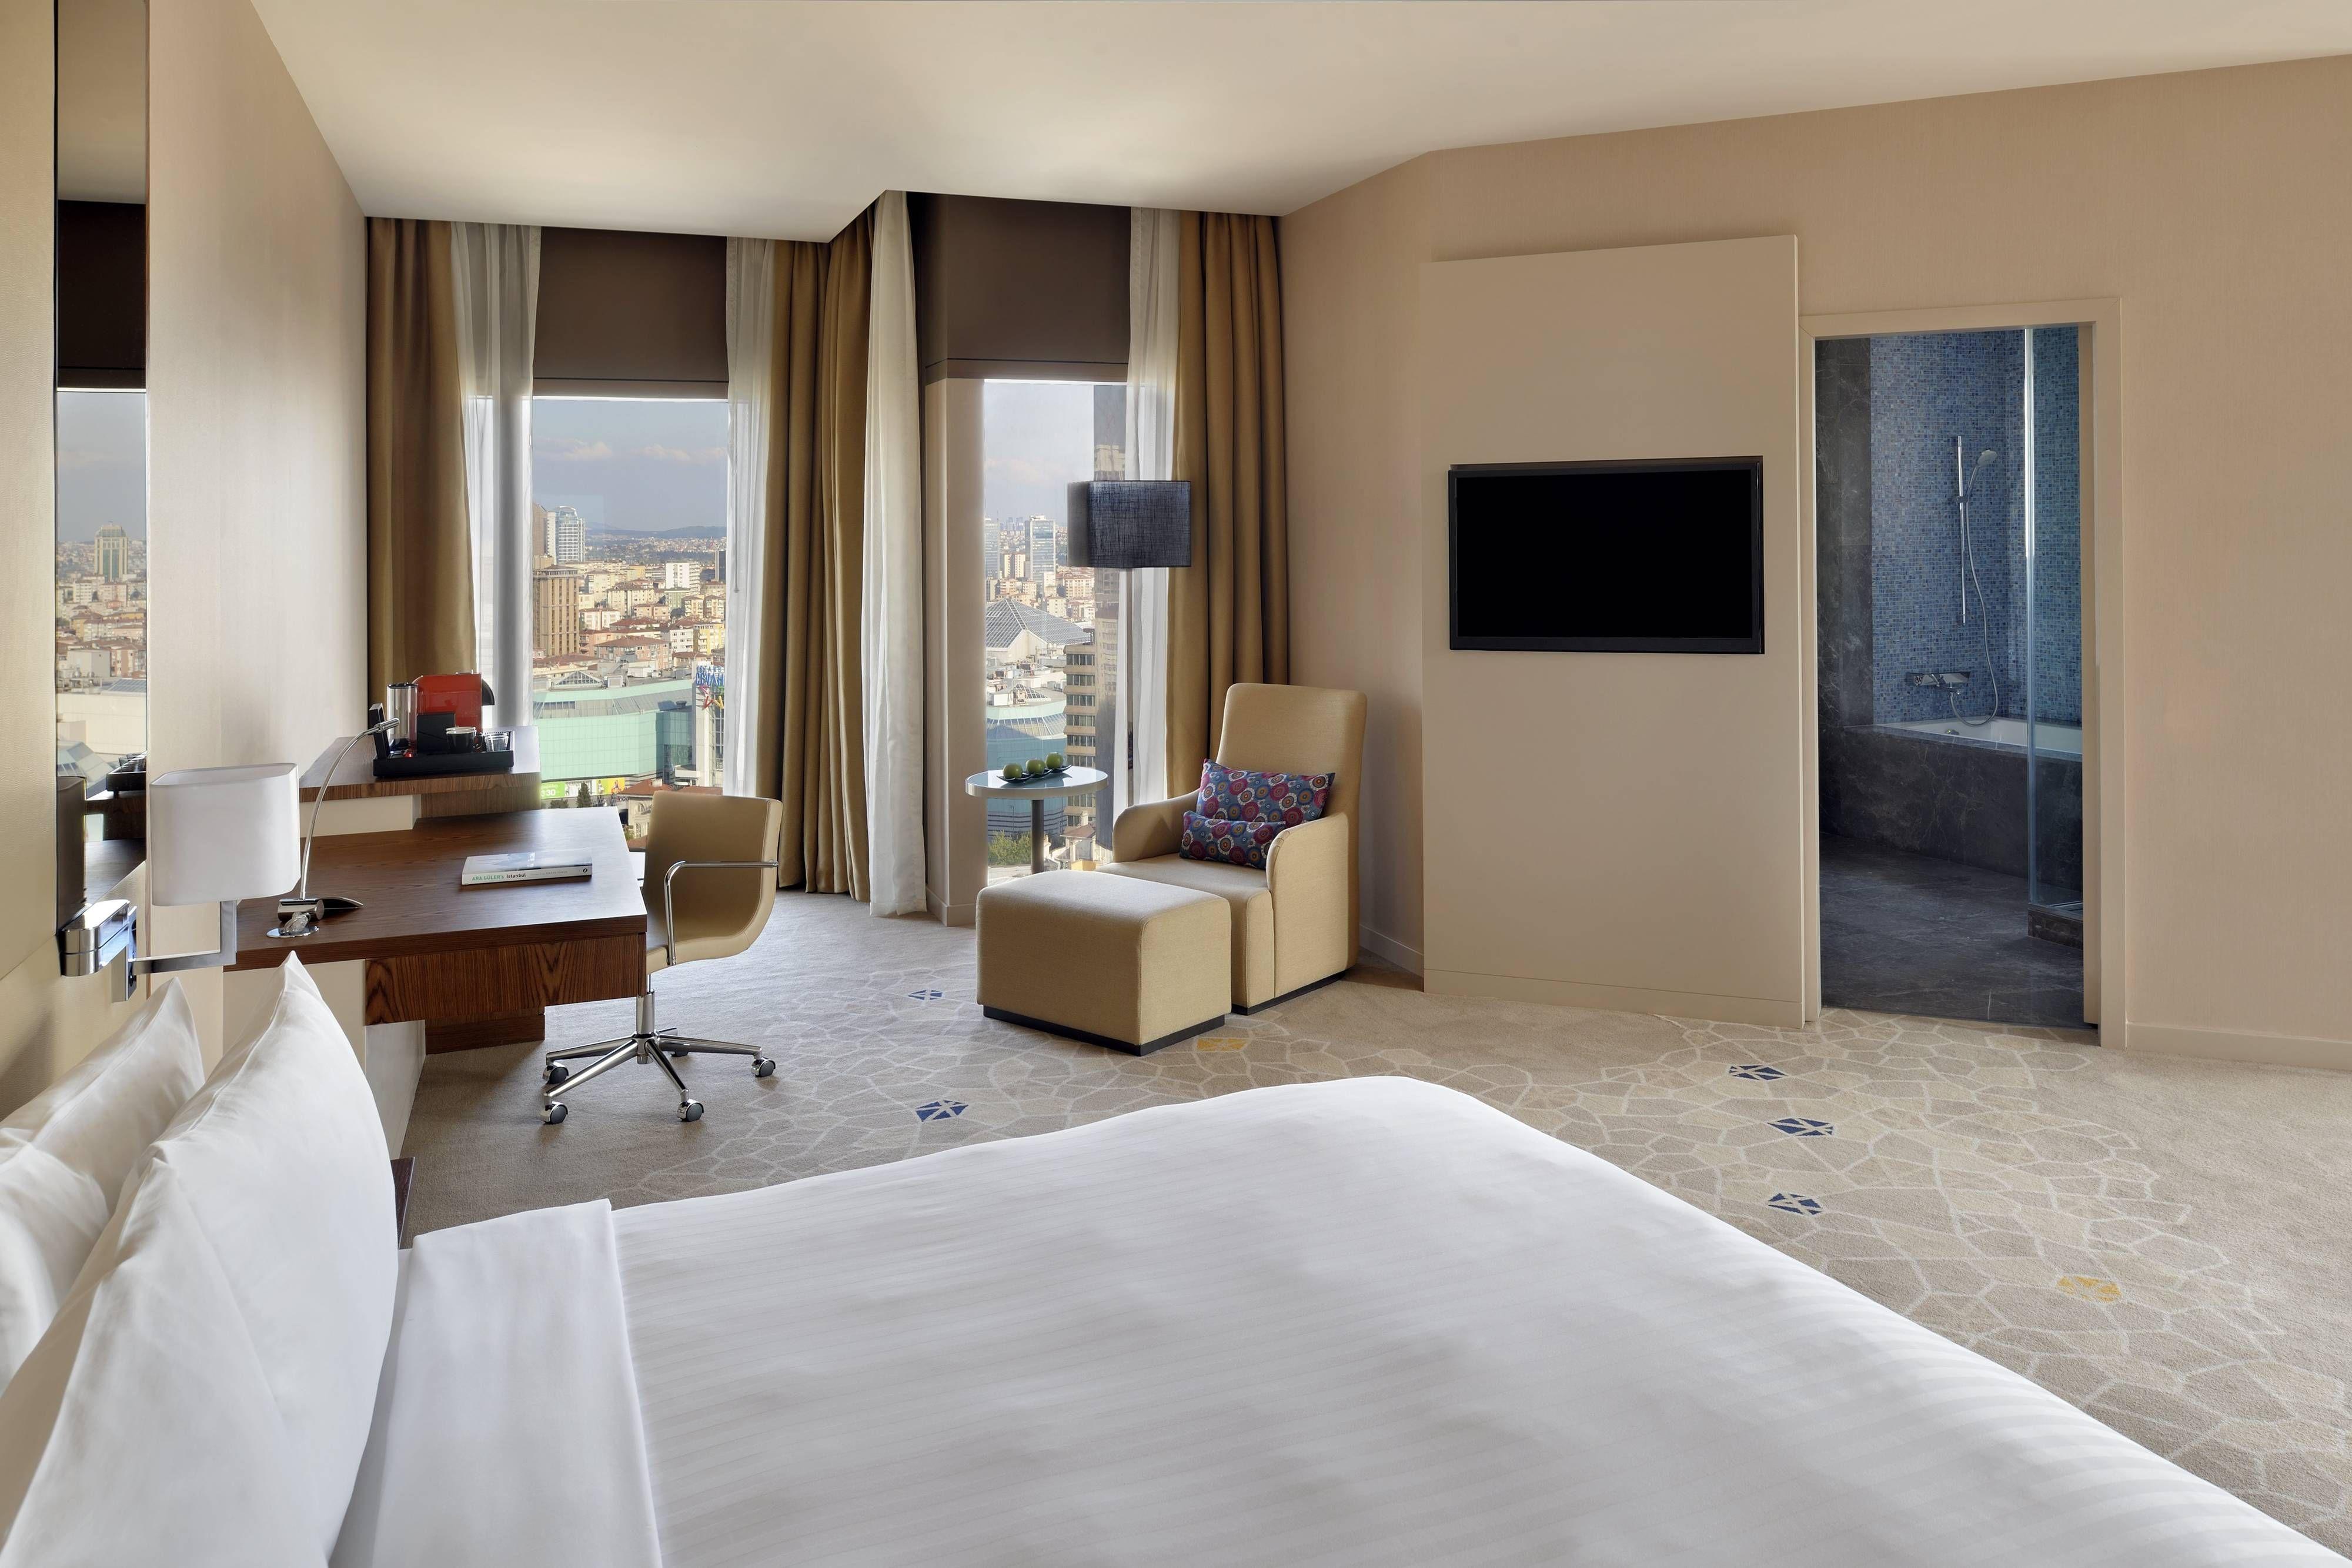 Istanbul Marriott Hotel Sisli Two Bedroom Suite Marriott Hotels Two Bedroom Suites Hotel